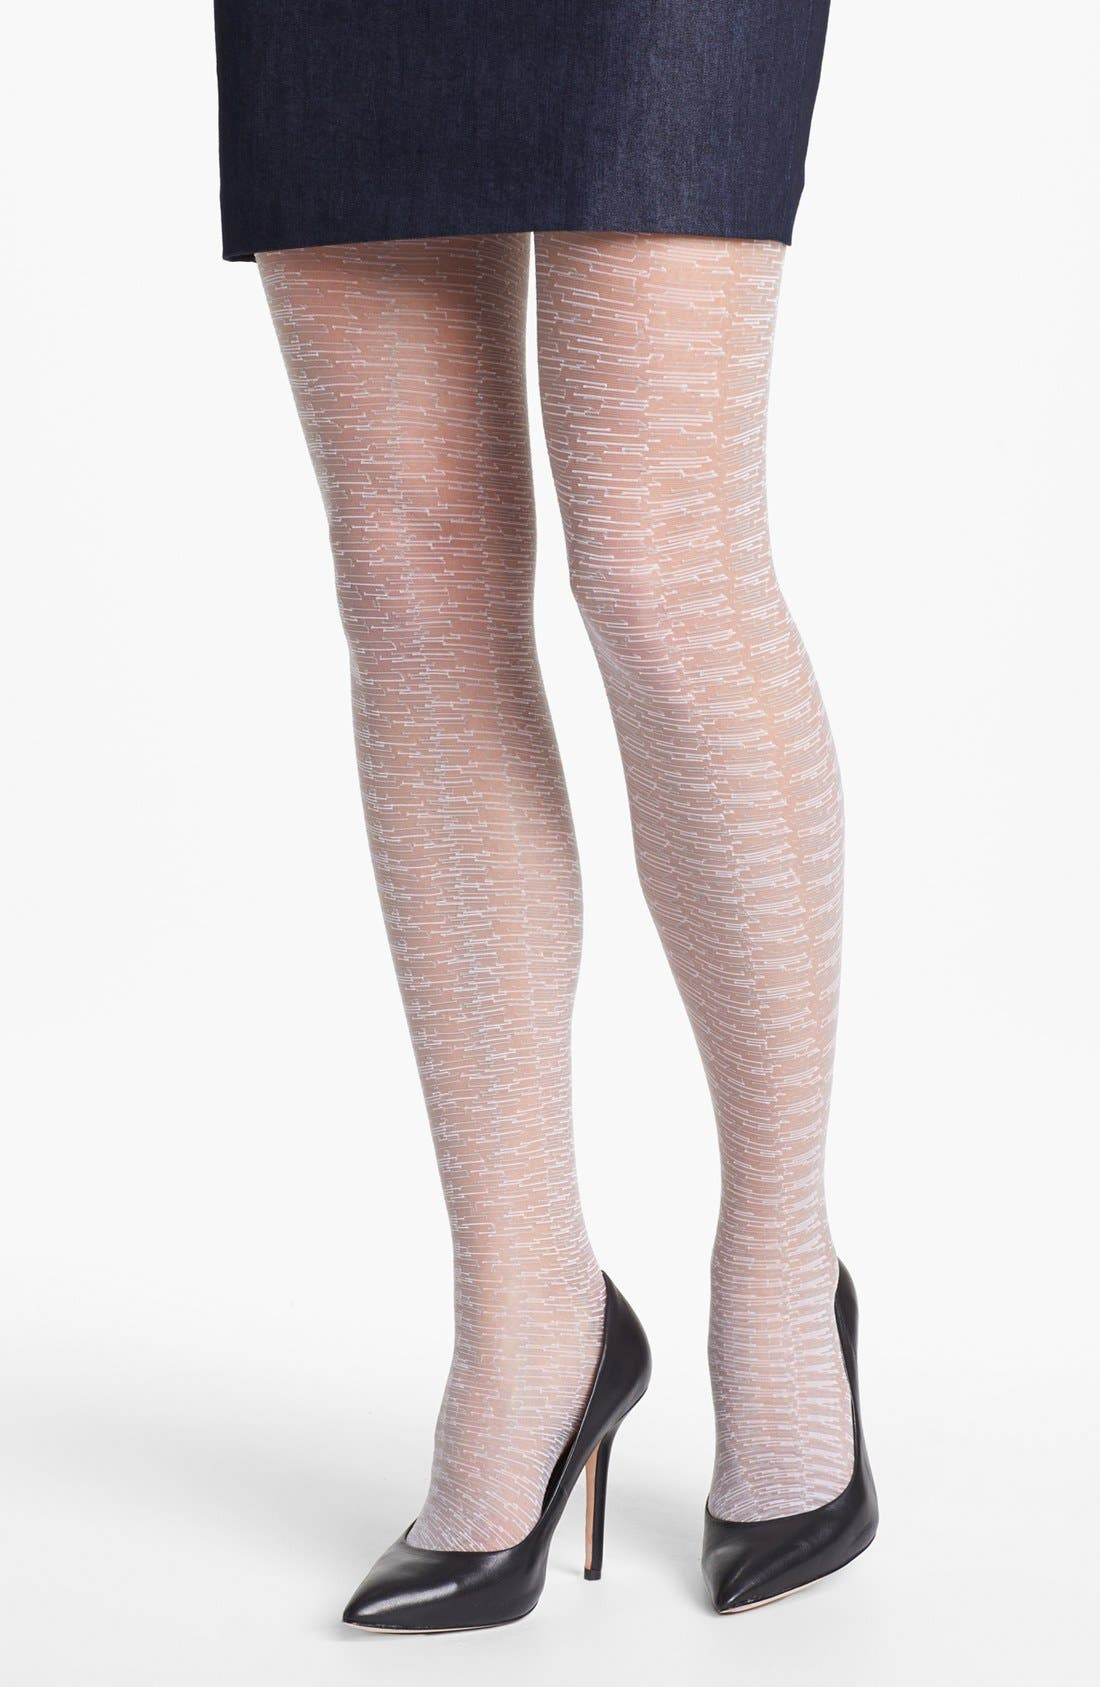 Alternate Image 1 Selected - Calvin Klein Sheer Textured Pantyhose